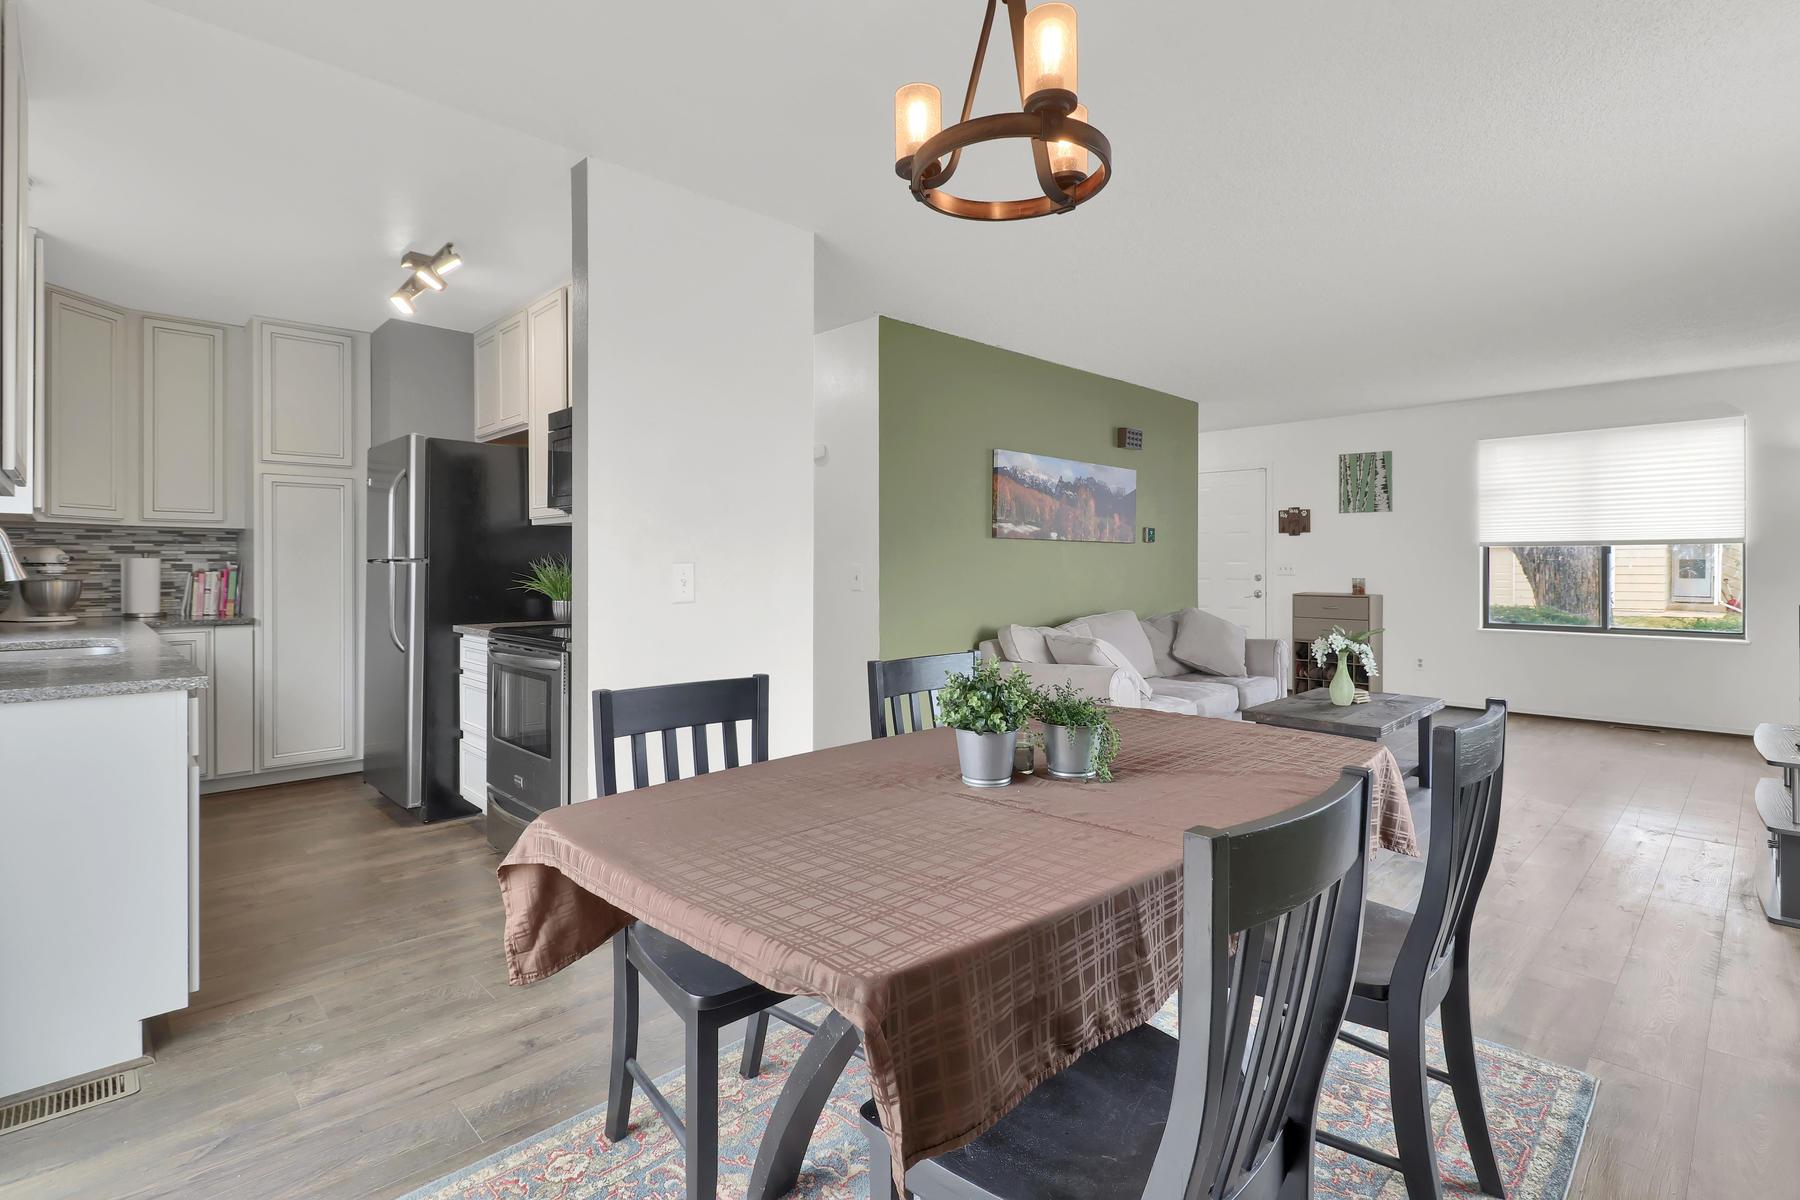 990 W 133rd Cir E Westminster-008-8-Dining Room-MLS_Size.jpg